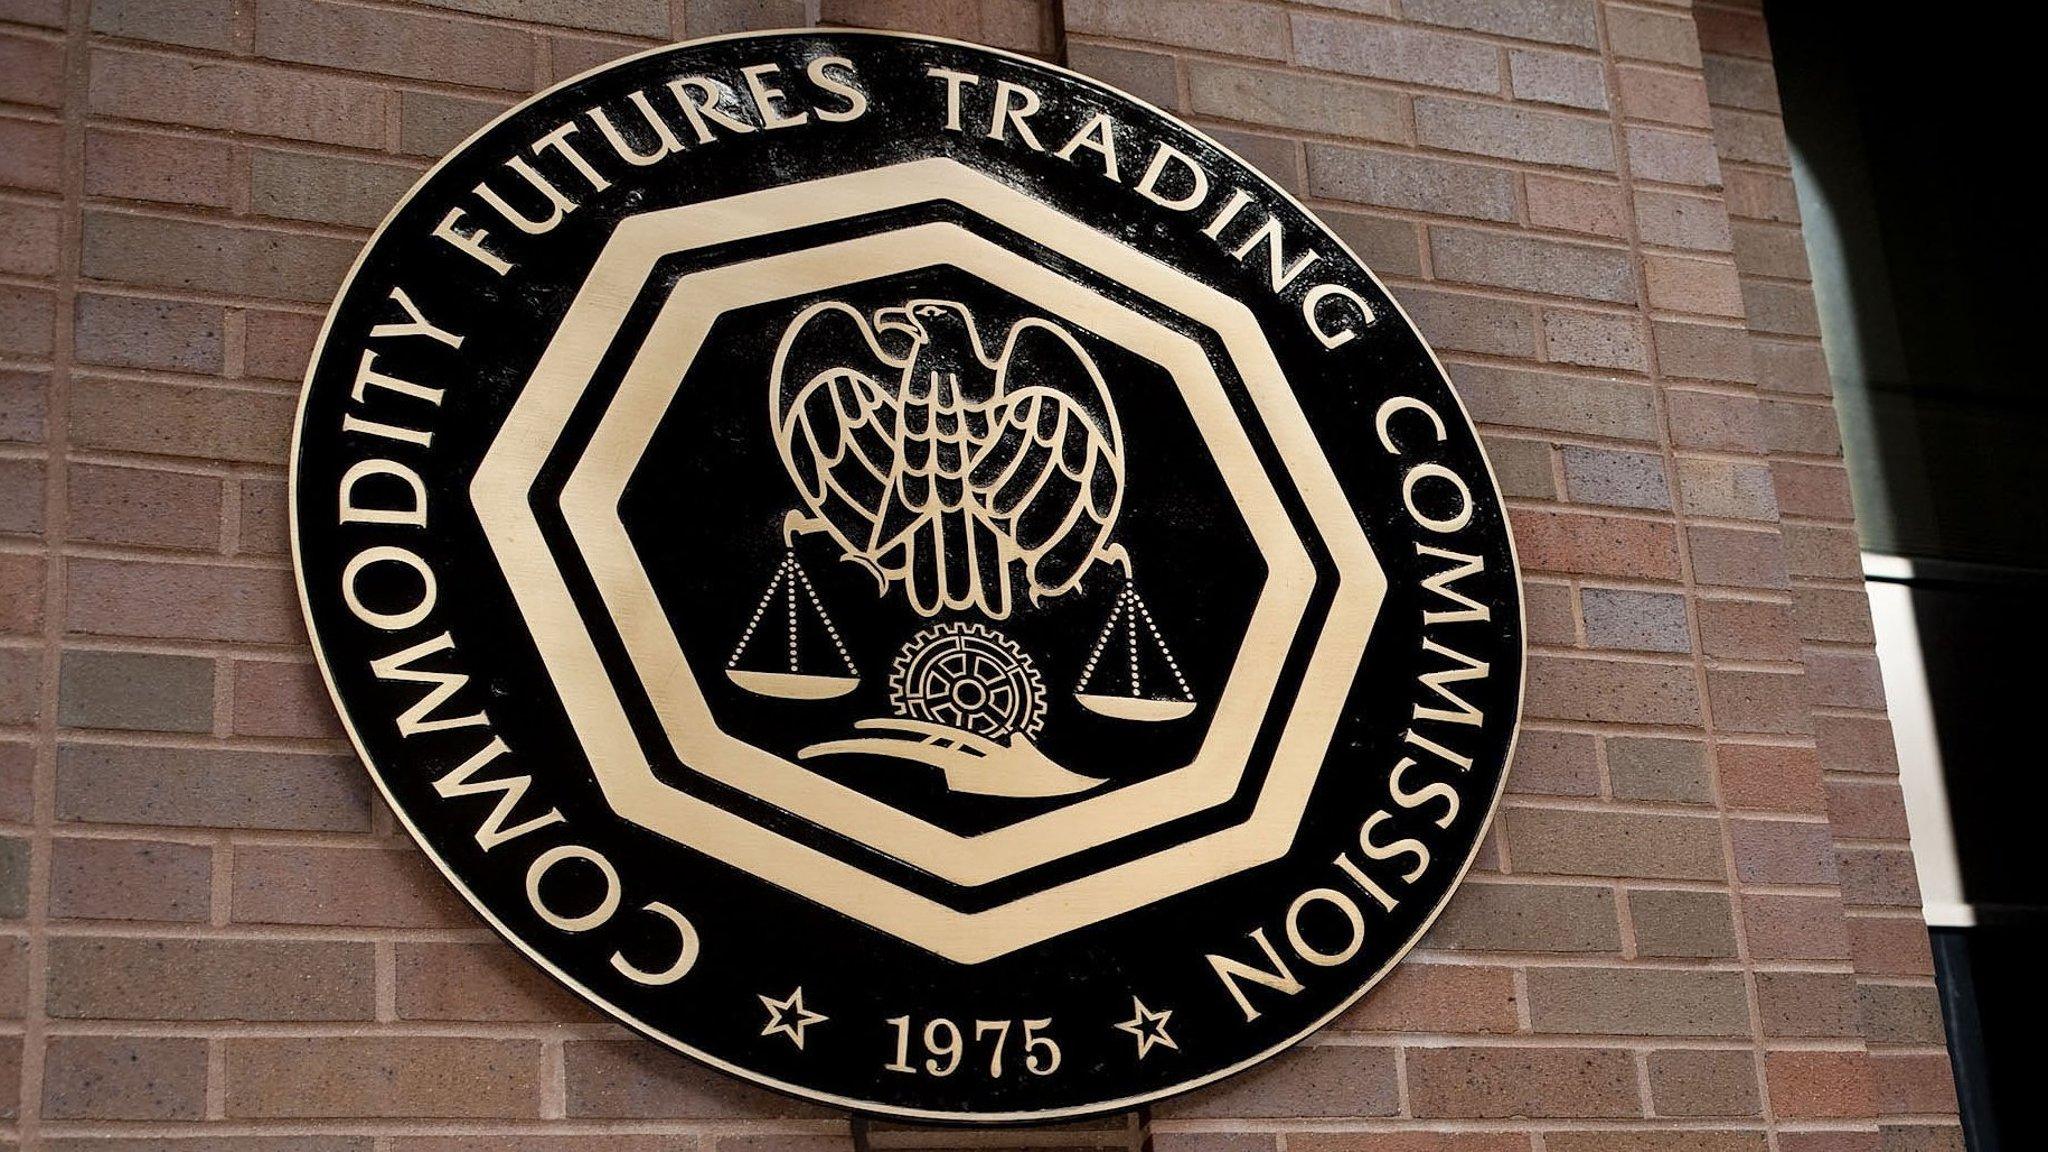 CFTC Files Charges against $10 Million Ponzi Scheme Involving Derivatives